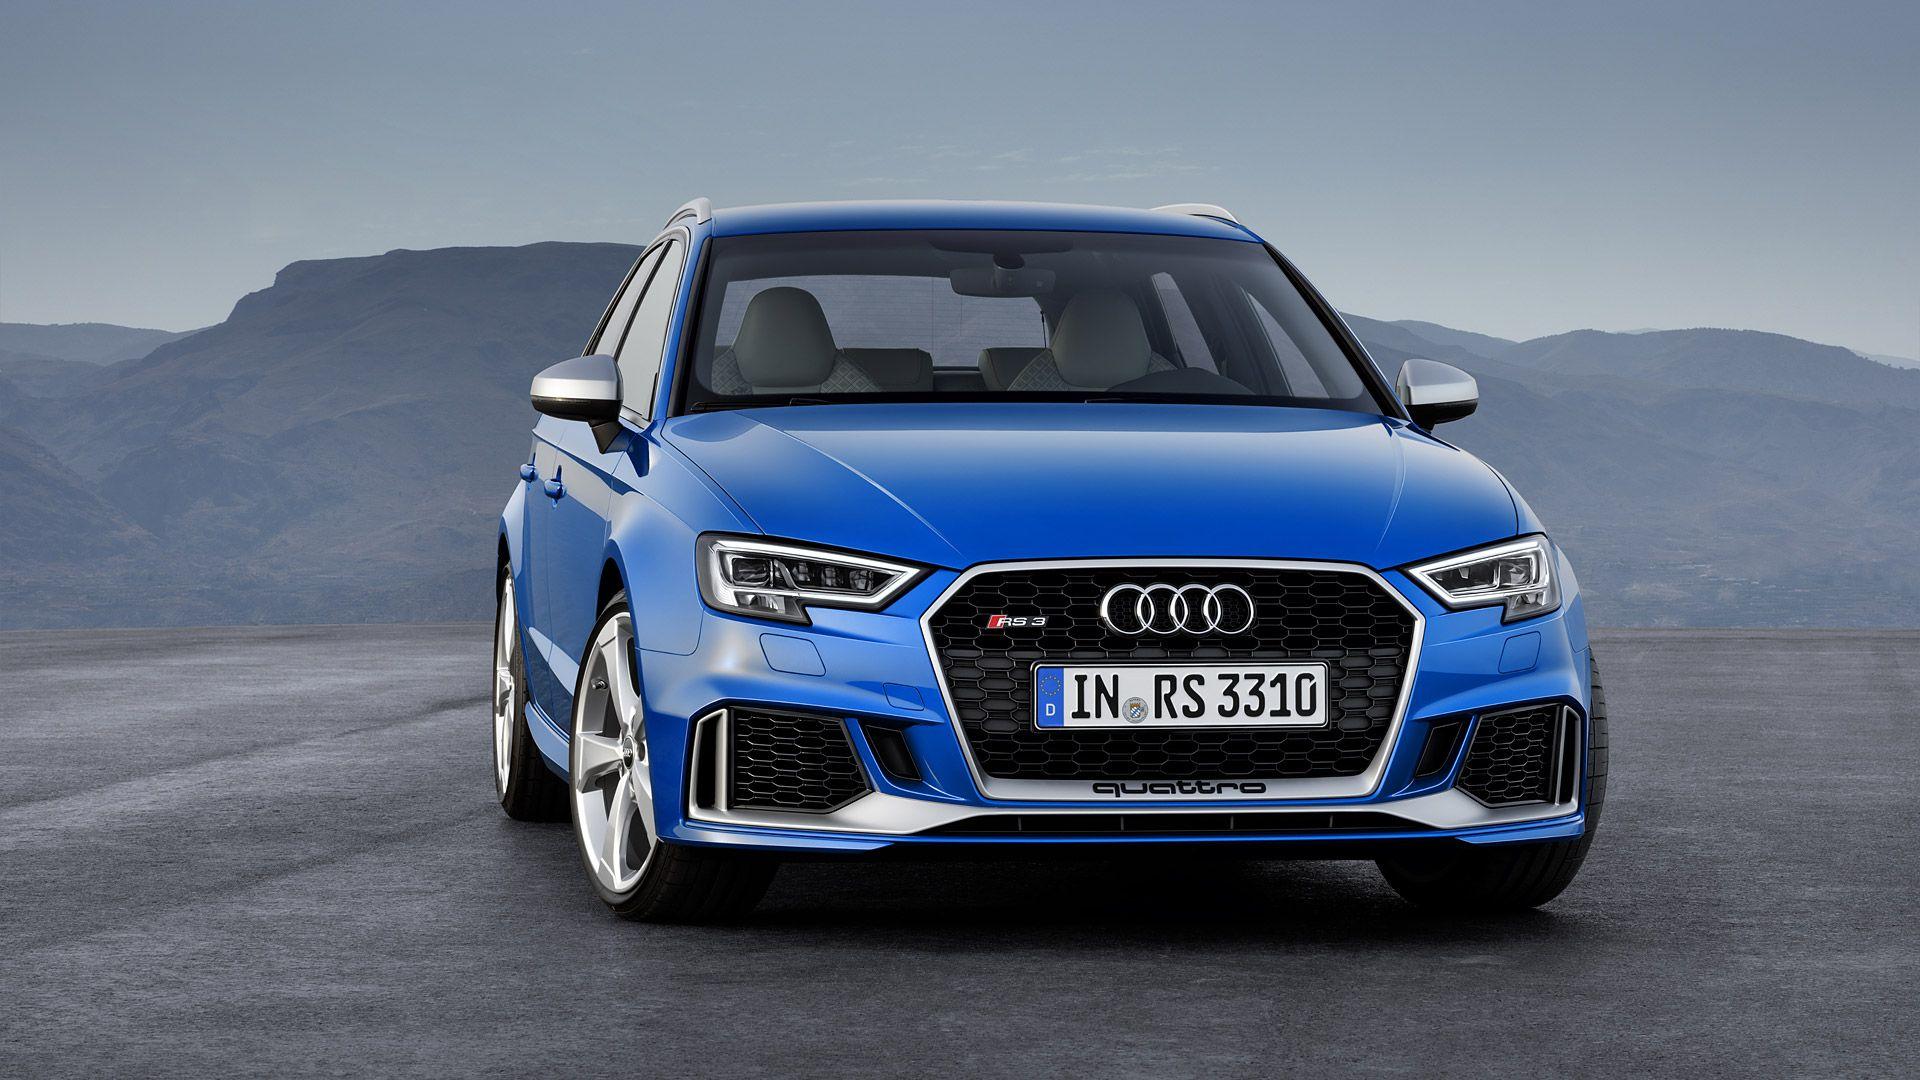 2018 Audi RS3 Sportback Audi rs3, Audi rs4, Audi rs